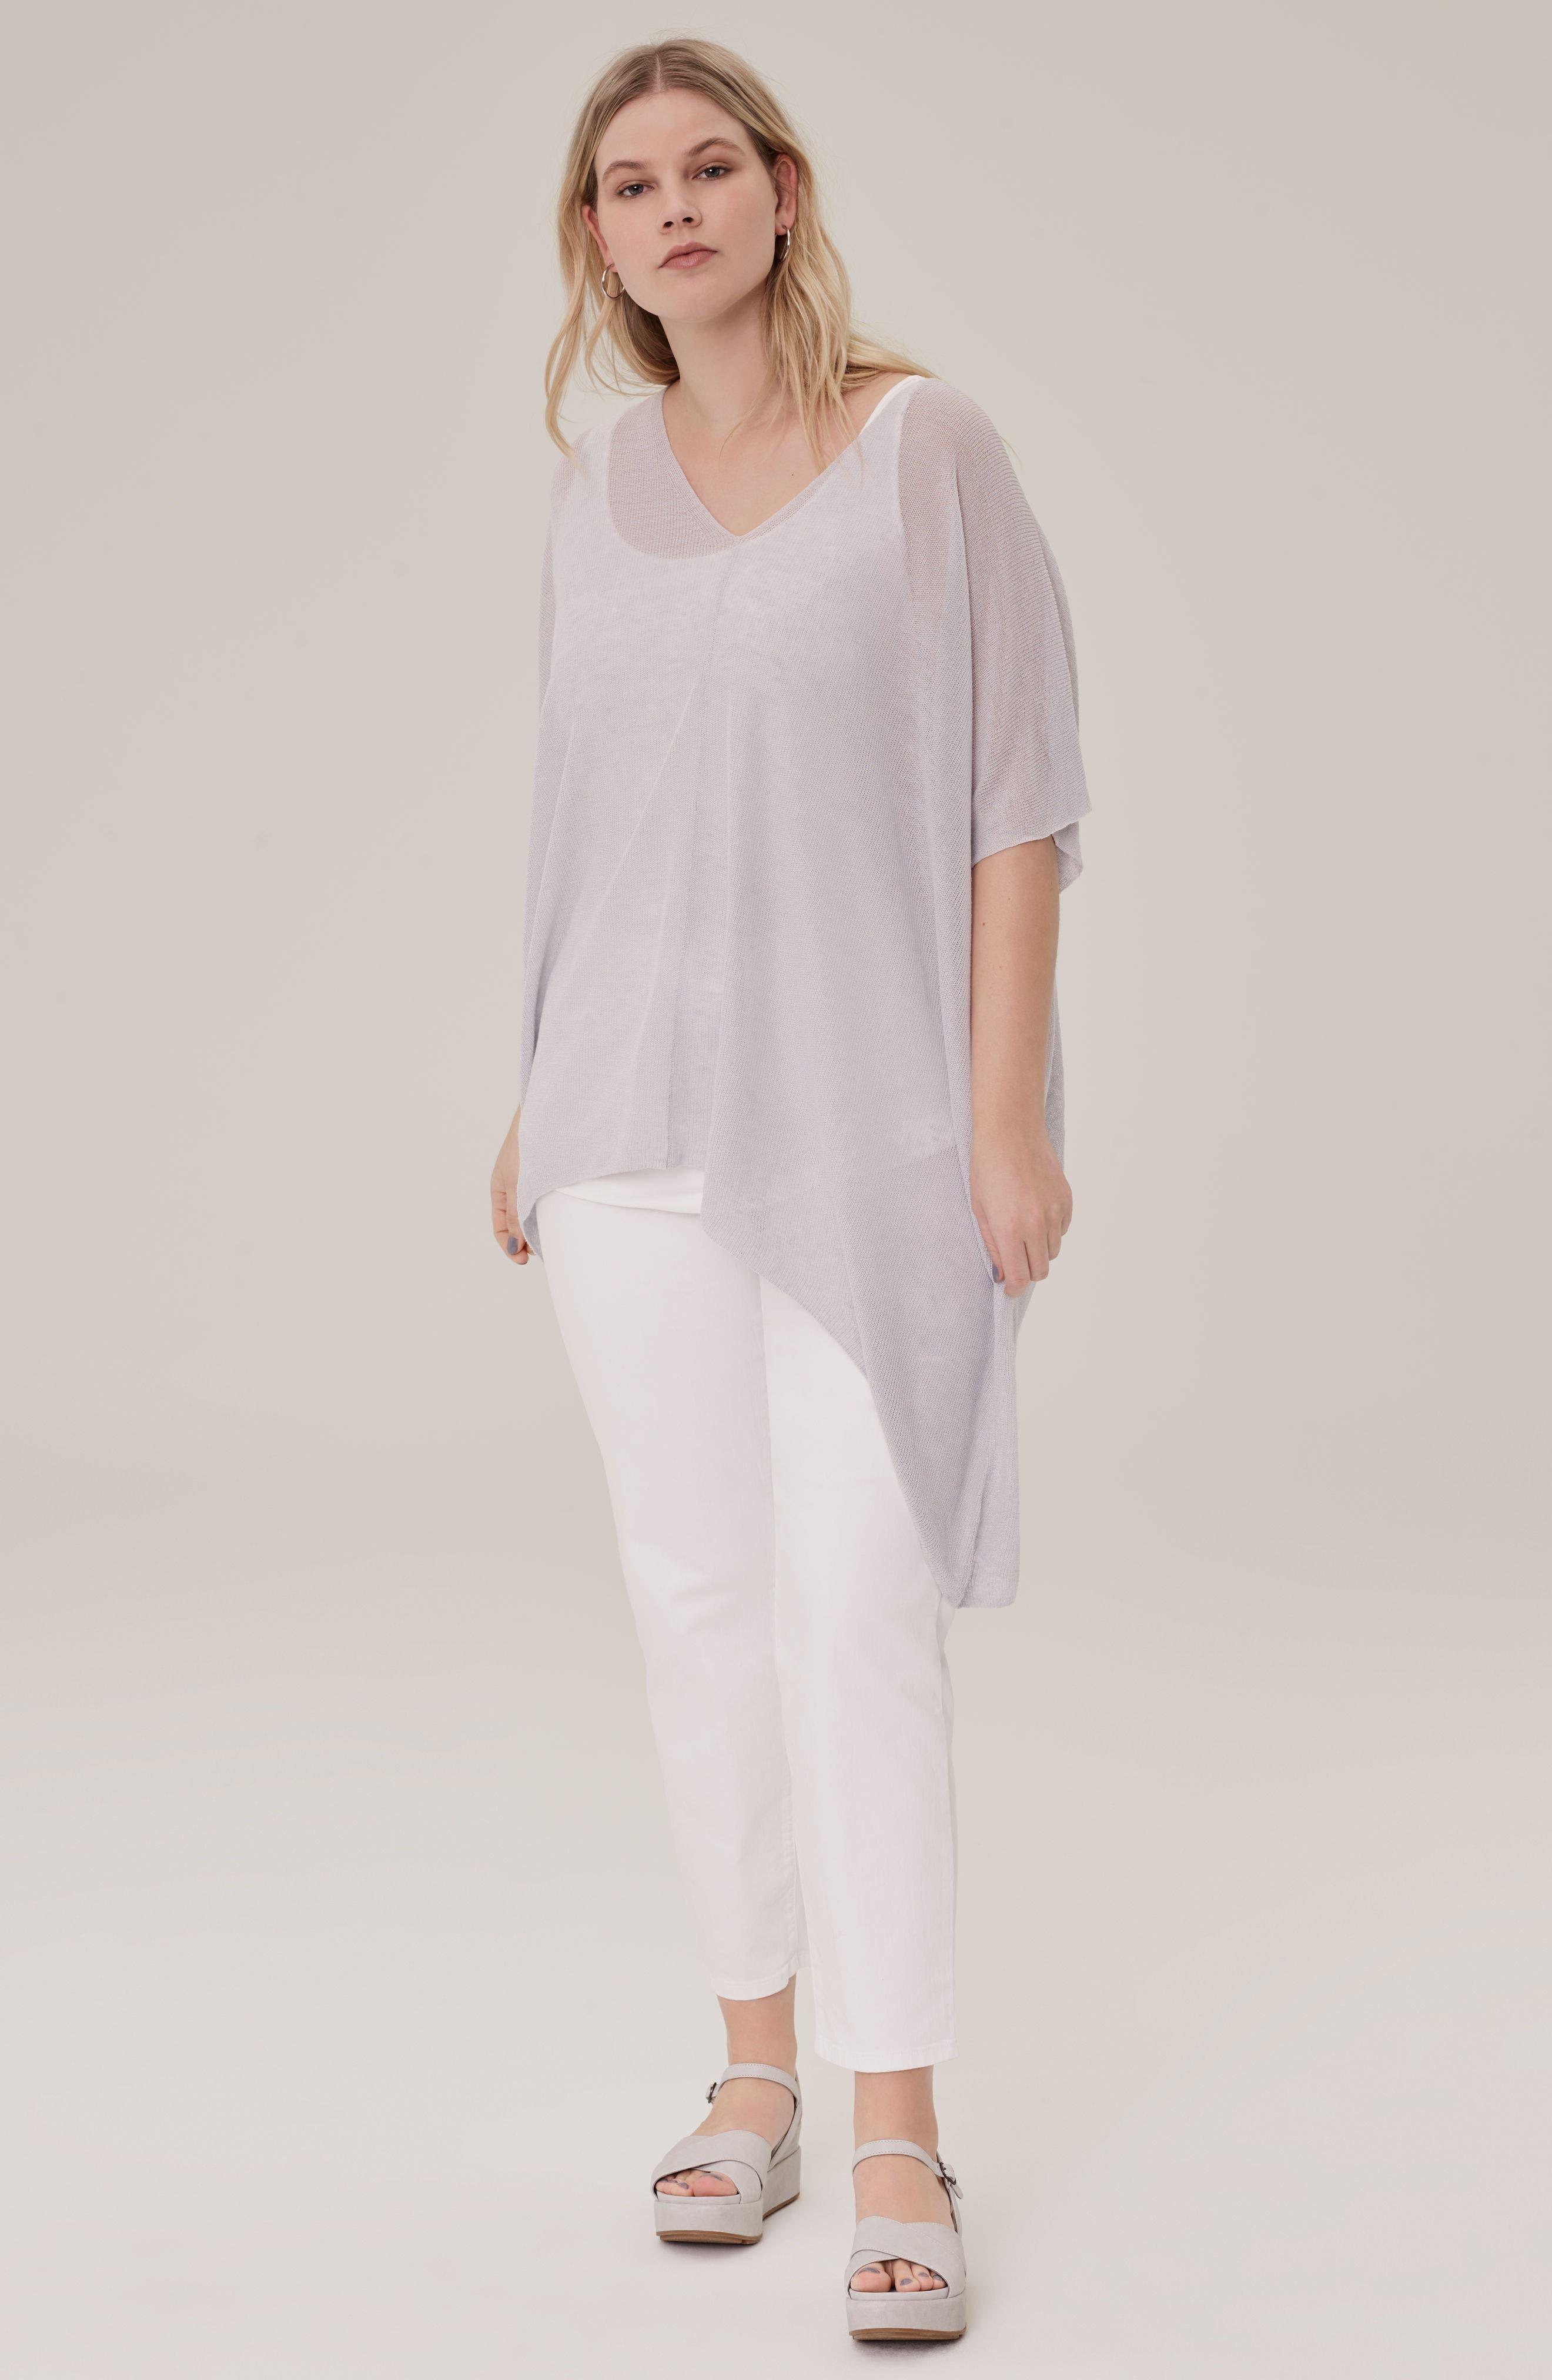 Stretch Organic Cotton Skinny Jeans,                             Alternate thumbnail 2, color,                             White